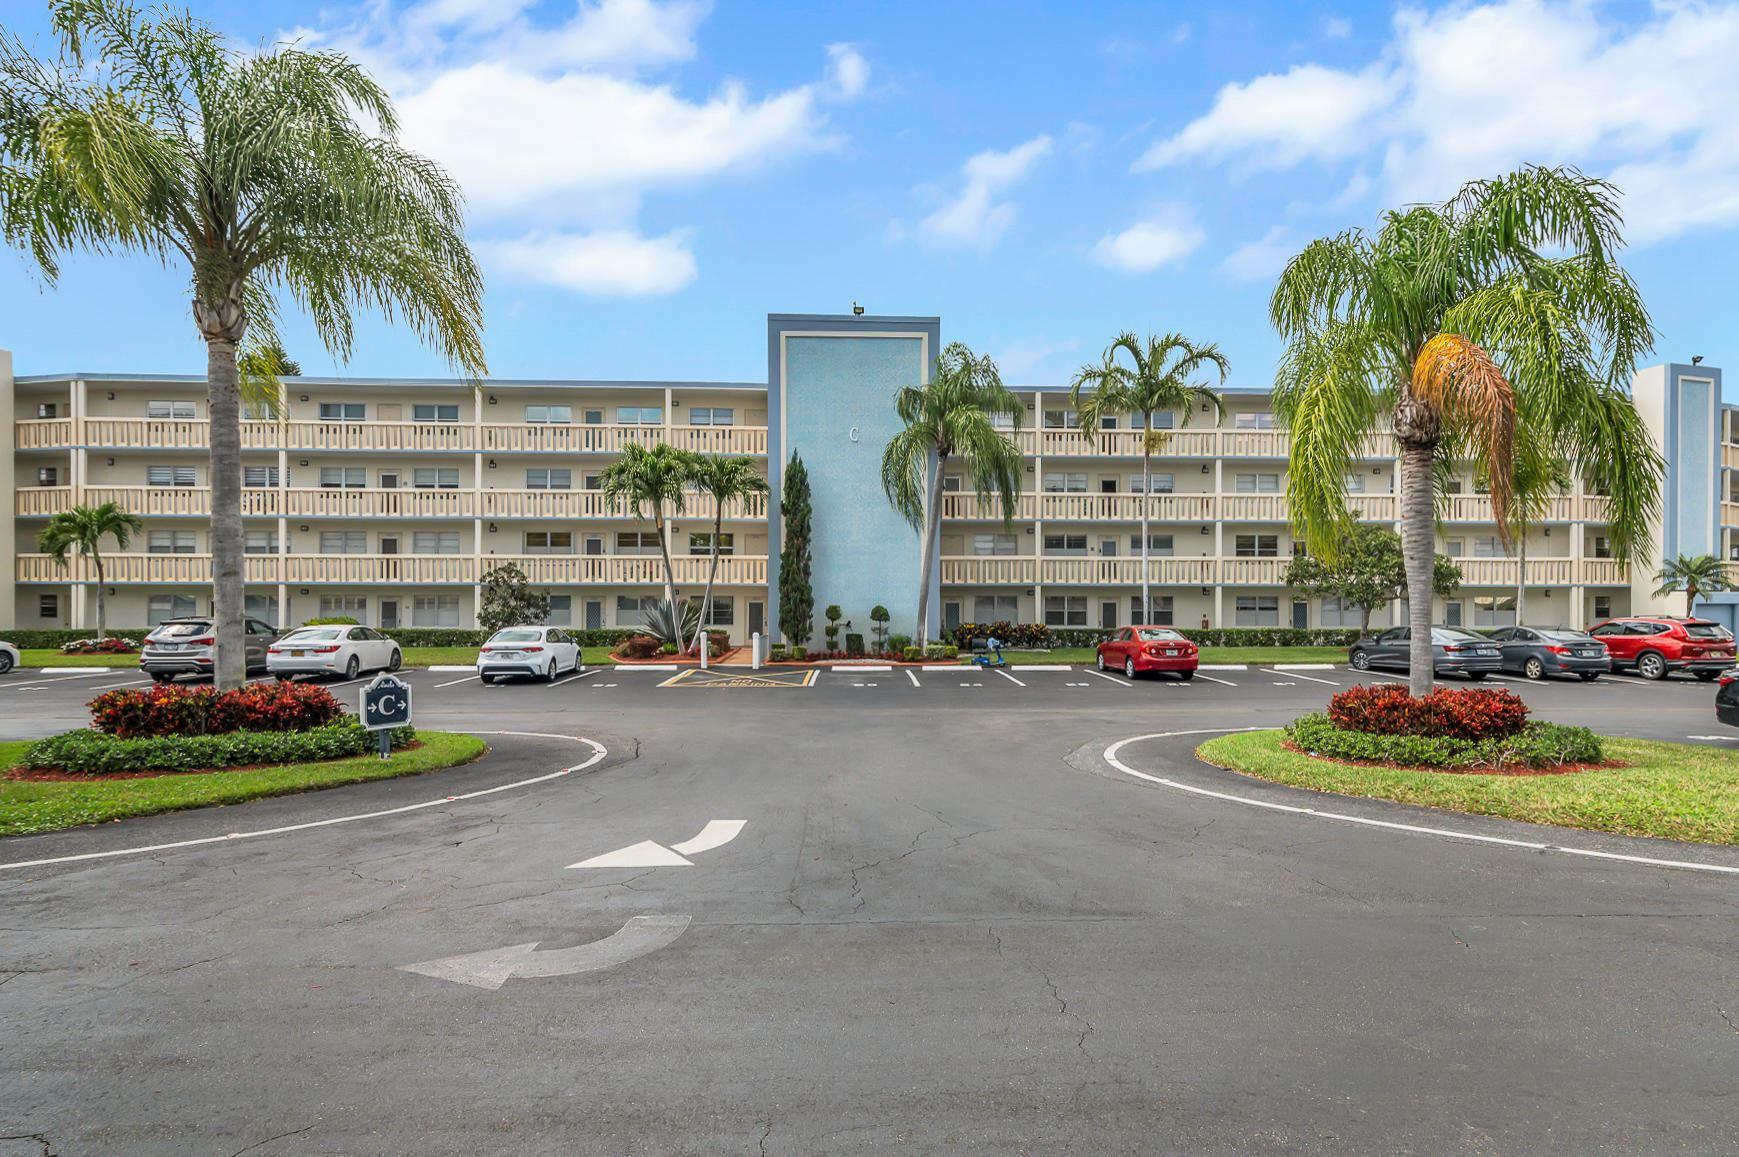 2041 Ainslie C, Boca Raton, FL 33434 - #: RX-10669101